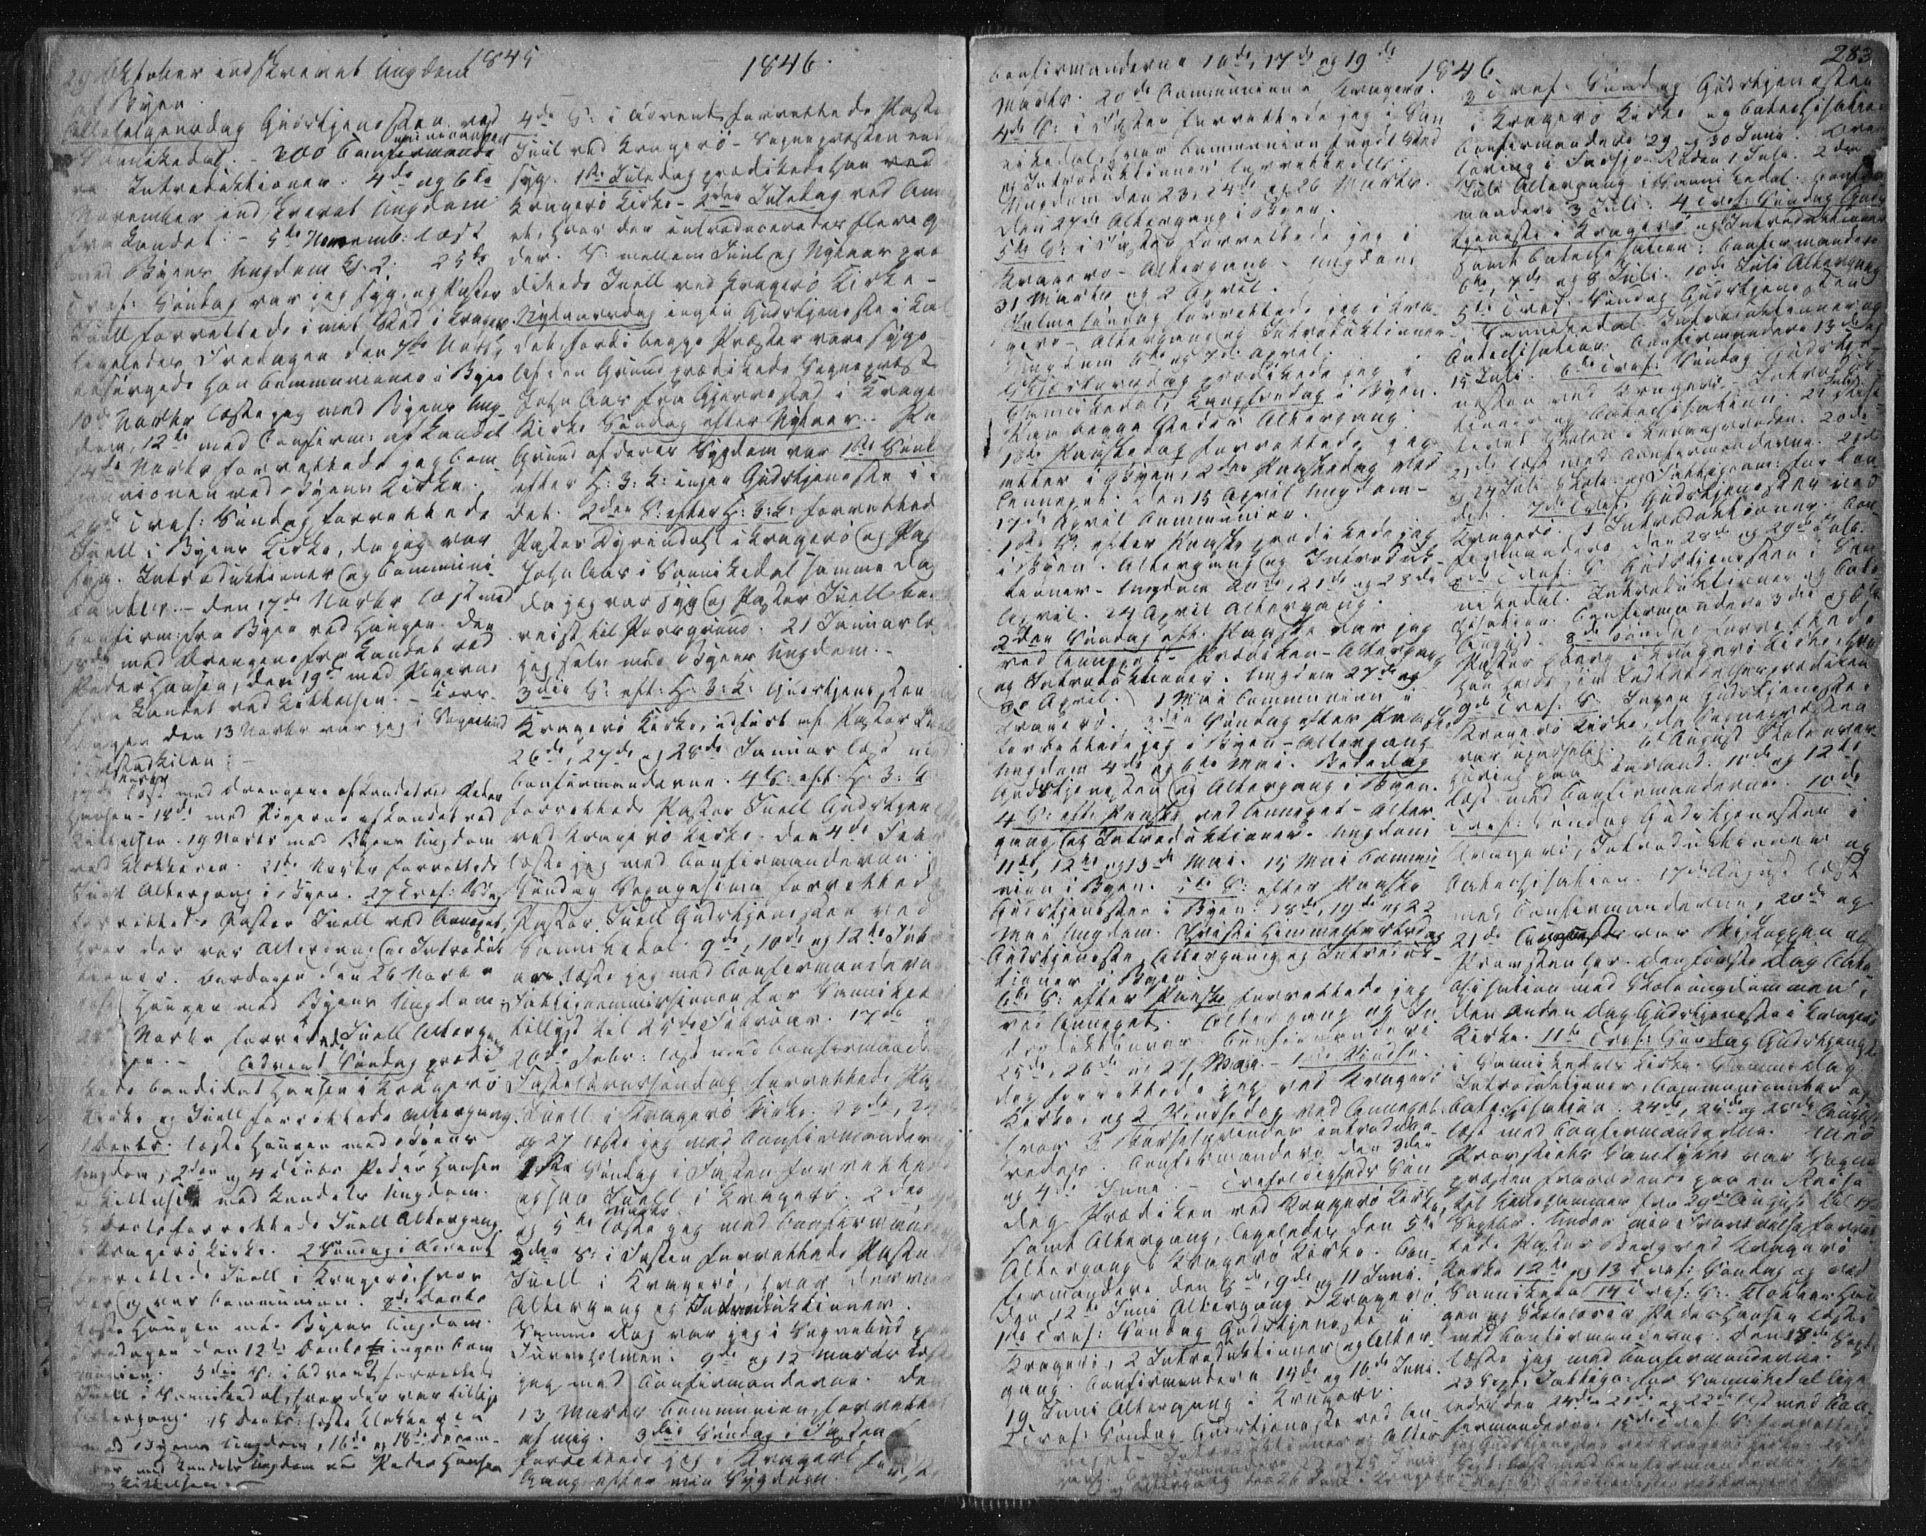 SAKO, Kragerø kirkebøker, F/Fa/L0005: Ministerialbok nr. 5, 1832-1847, s. 283